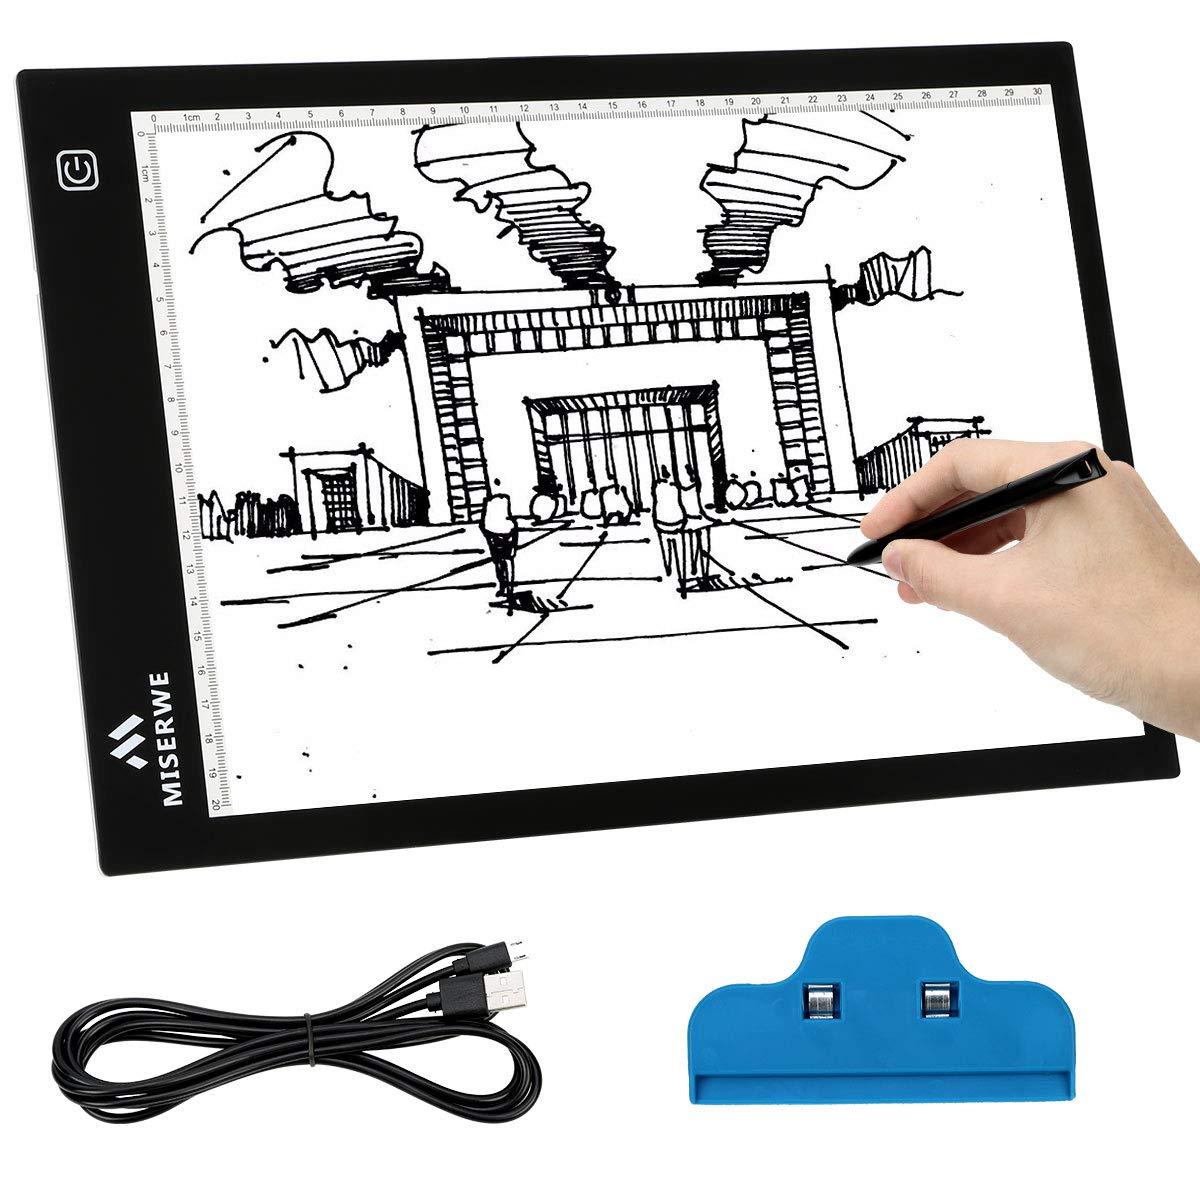 MISERWE A4ライトテーブル 4.7mm 超薄型 USB電源供給 ポータブル LEDライトボックス アートクラフト トレーシングパッド スケッチ アーティスト ドローイング アニメーション ステンシル Xレイビュー   B07QWRVPNC